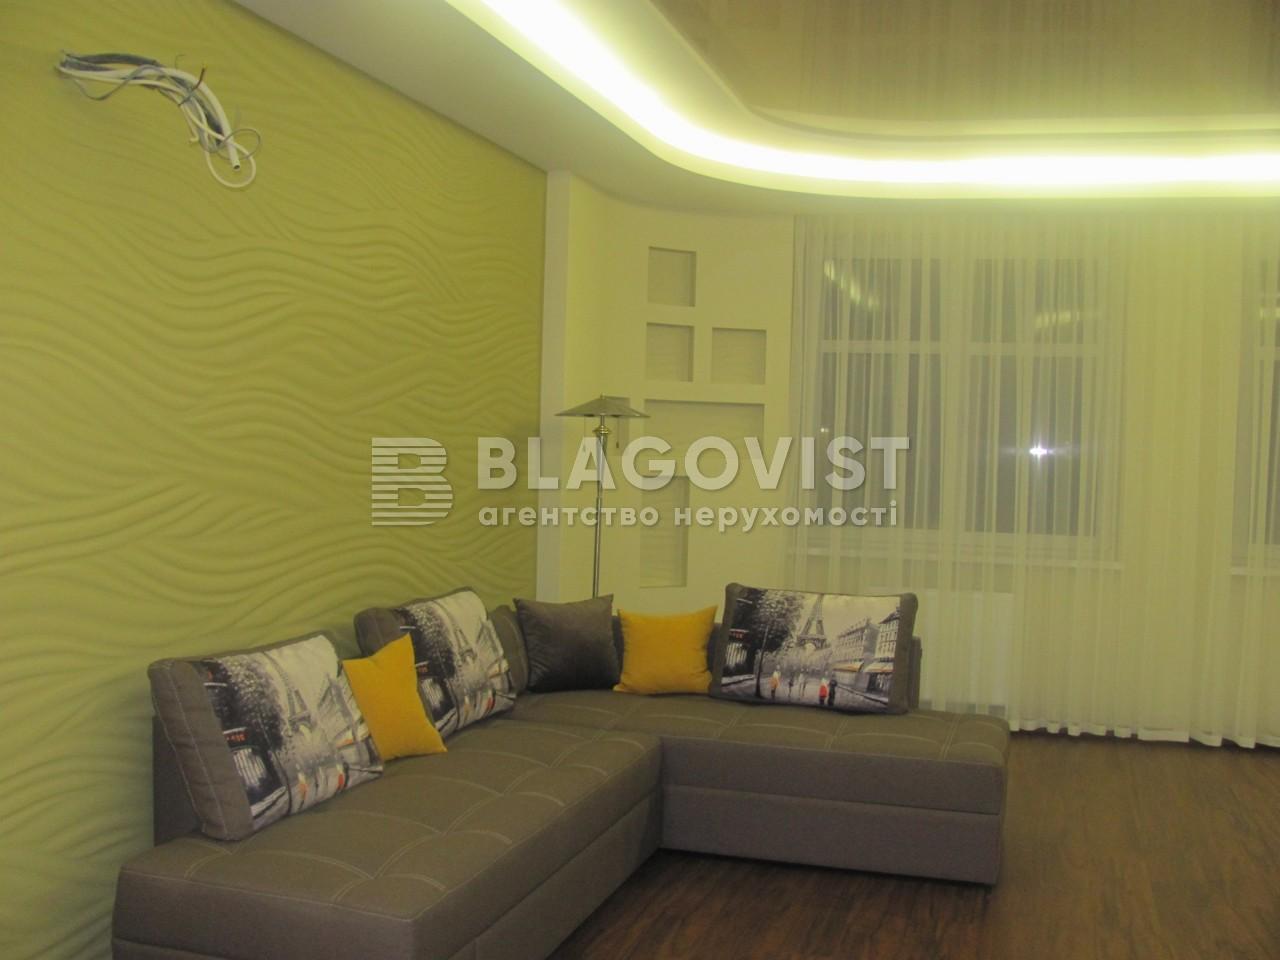 Квартира H-42937, Коновальця Євгена (Щорса), 32б, Київ - Фото 6